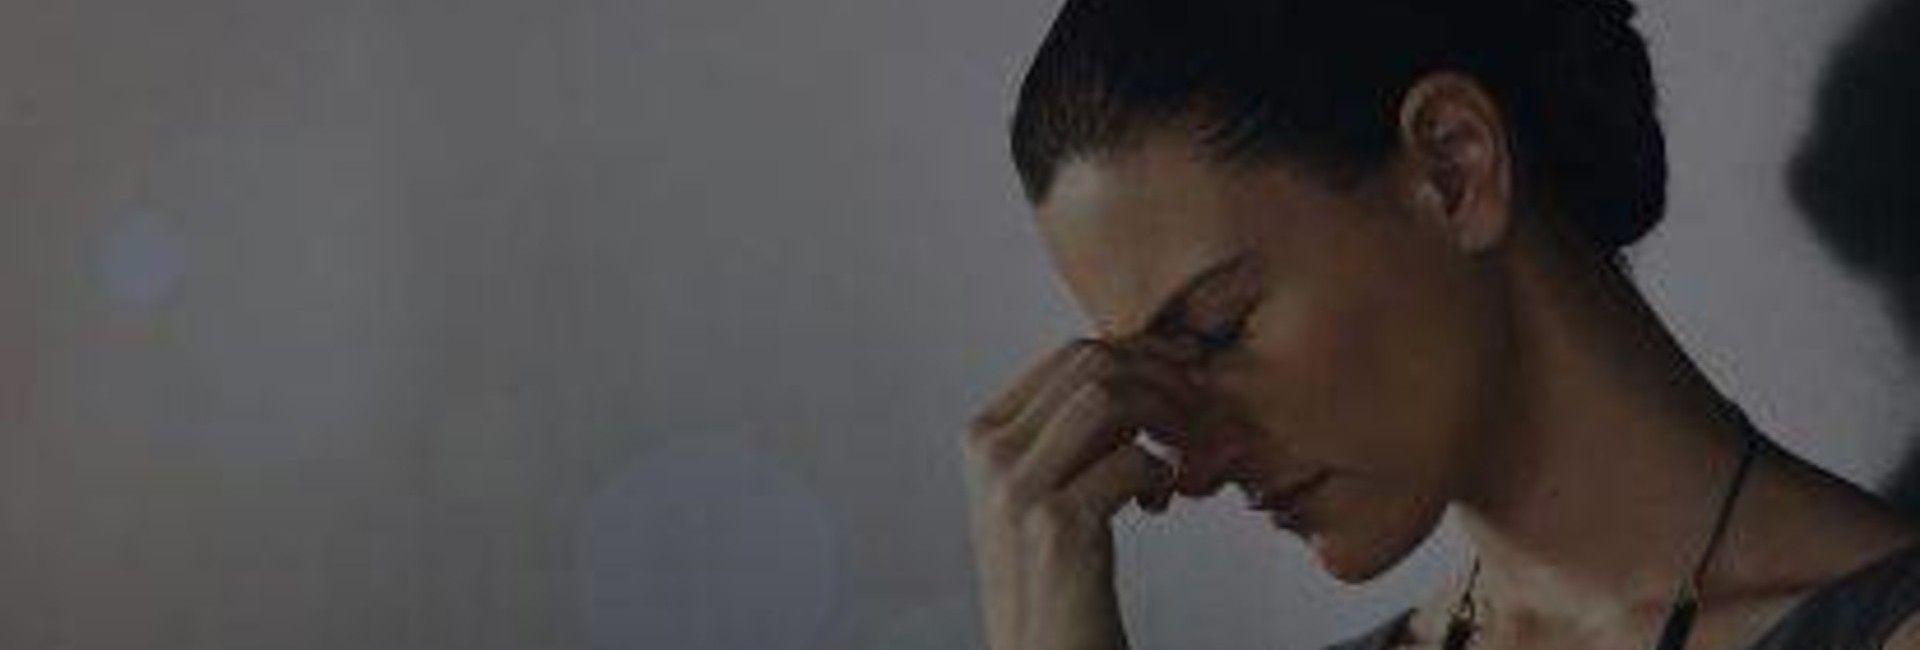 reducing stress through mindfulness